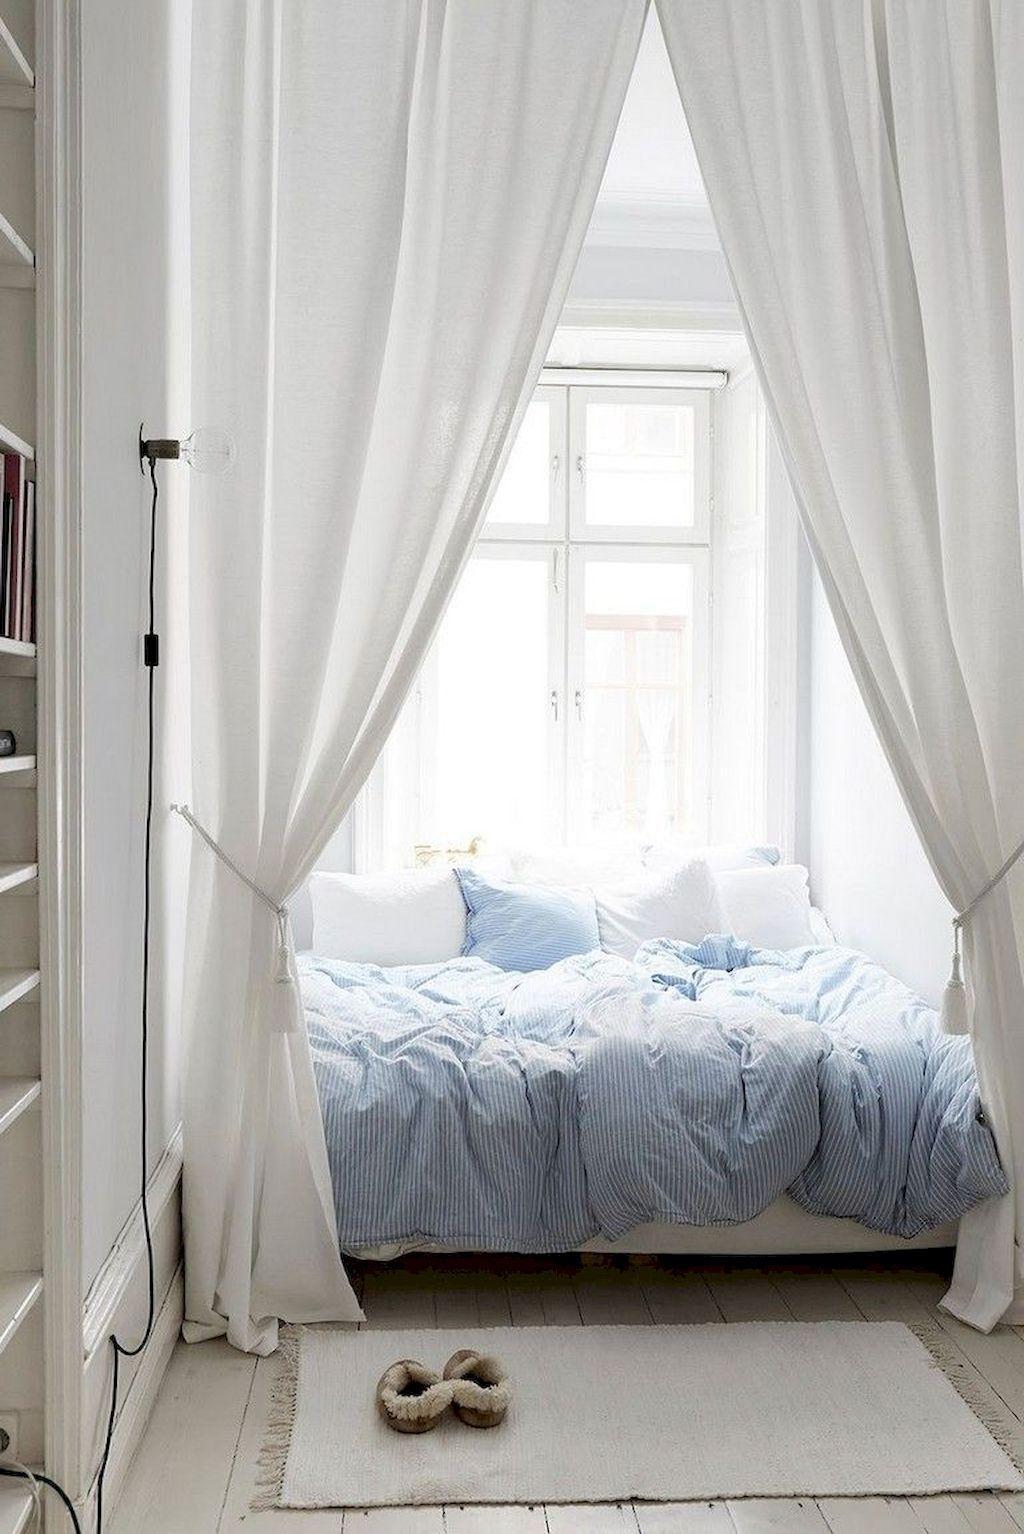 Astonishing Rental Apartment Decorating Ideas 45